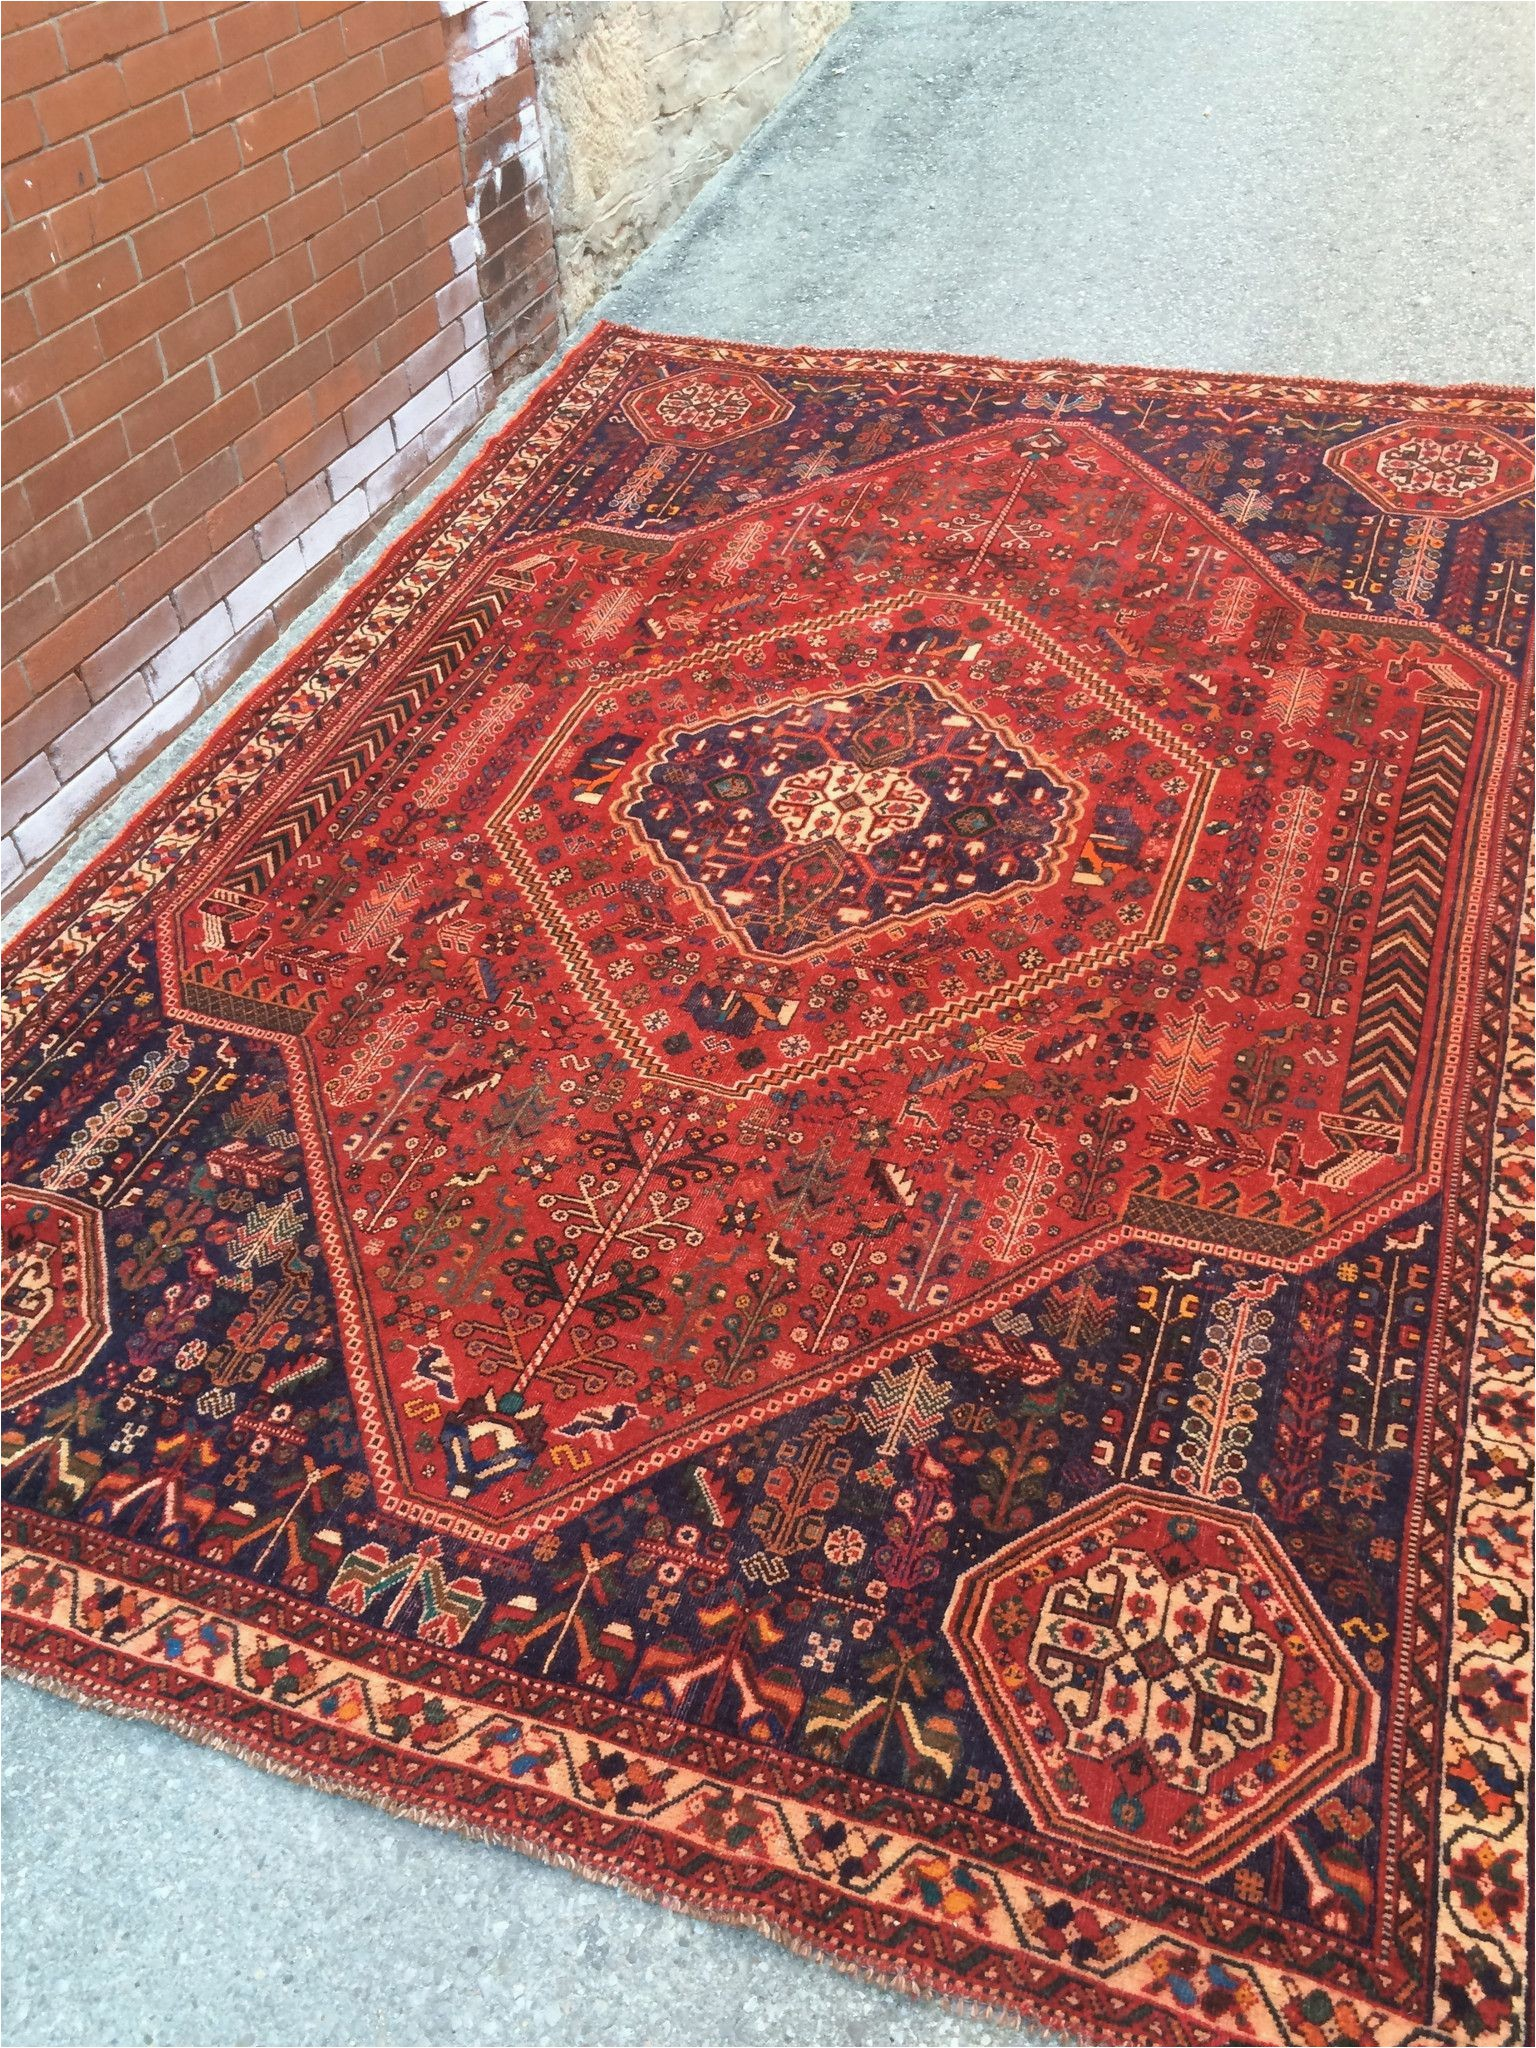 7 x 9 dining room rugs